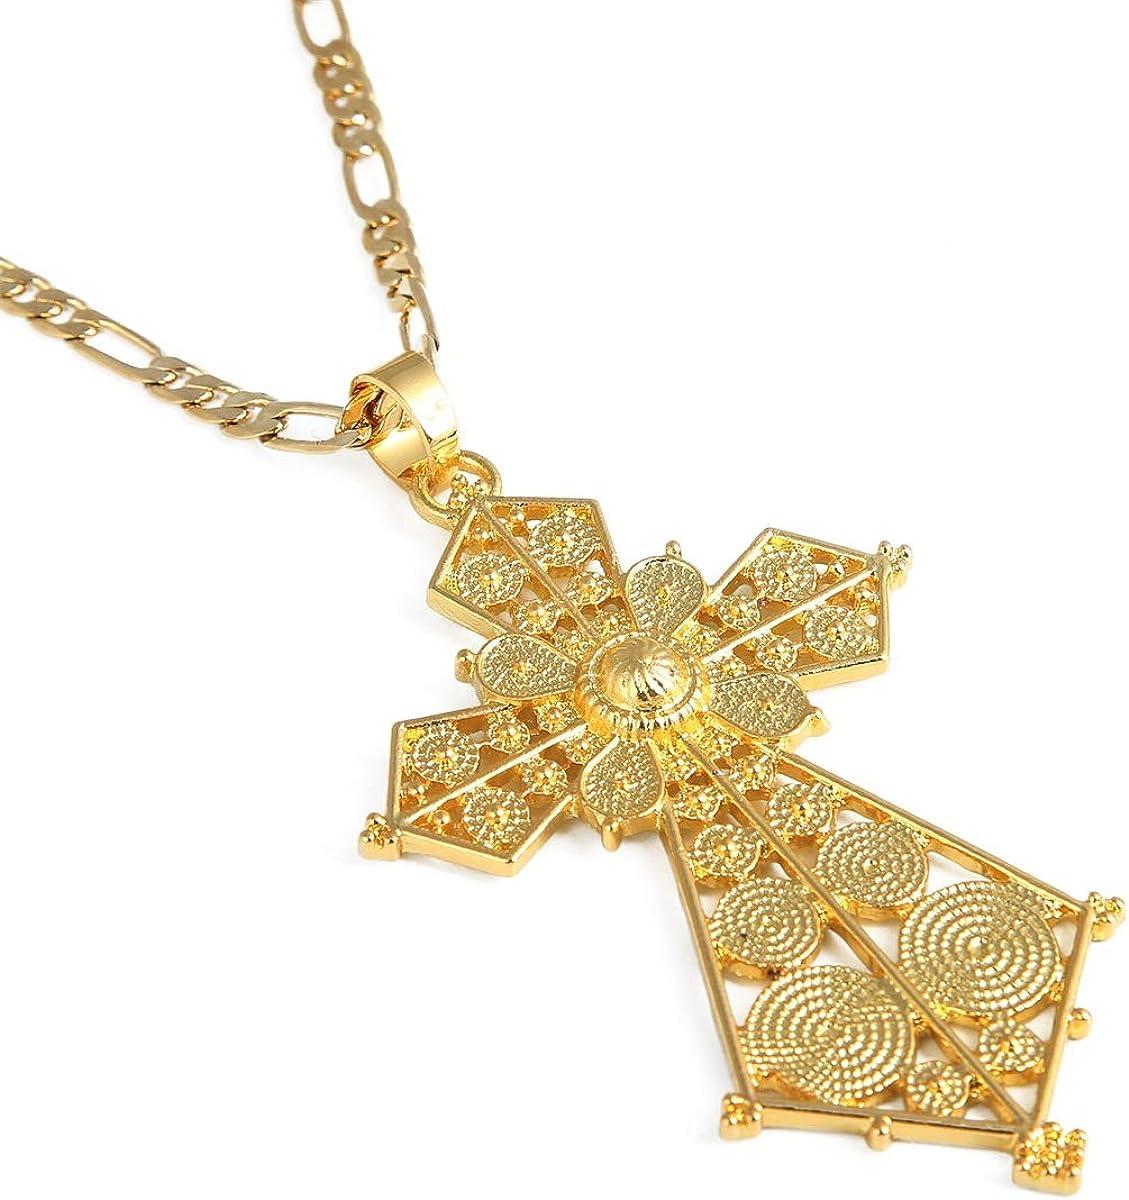 Ethiopian Pendant Jewelry for Women Eritrean African Fashion Wedding Jewelry Middle East Arab Jewelry